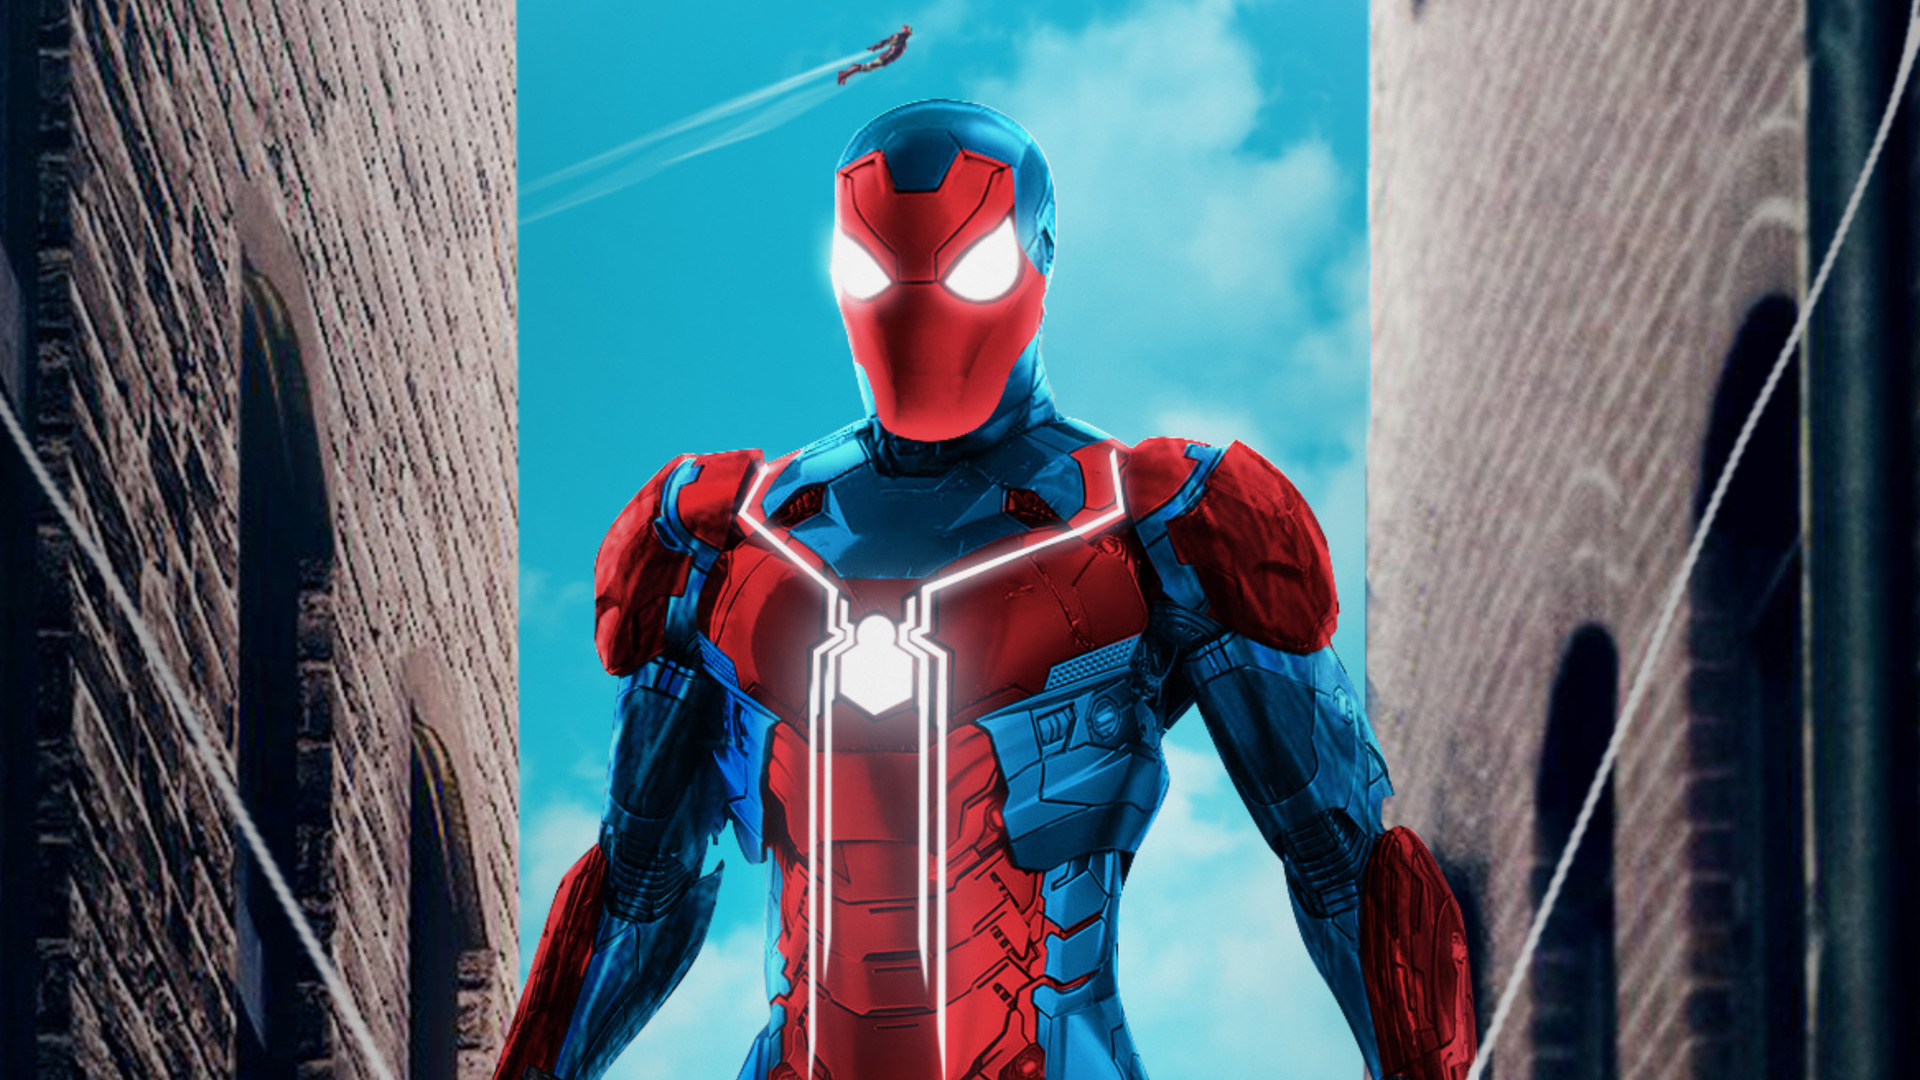 Spiderman New Suit Hd Wallpaper